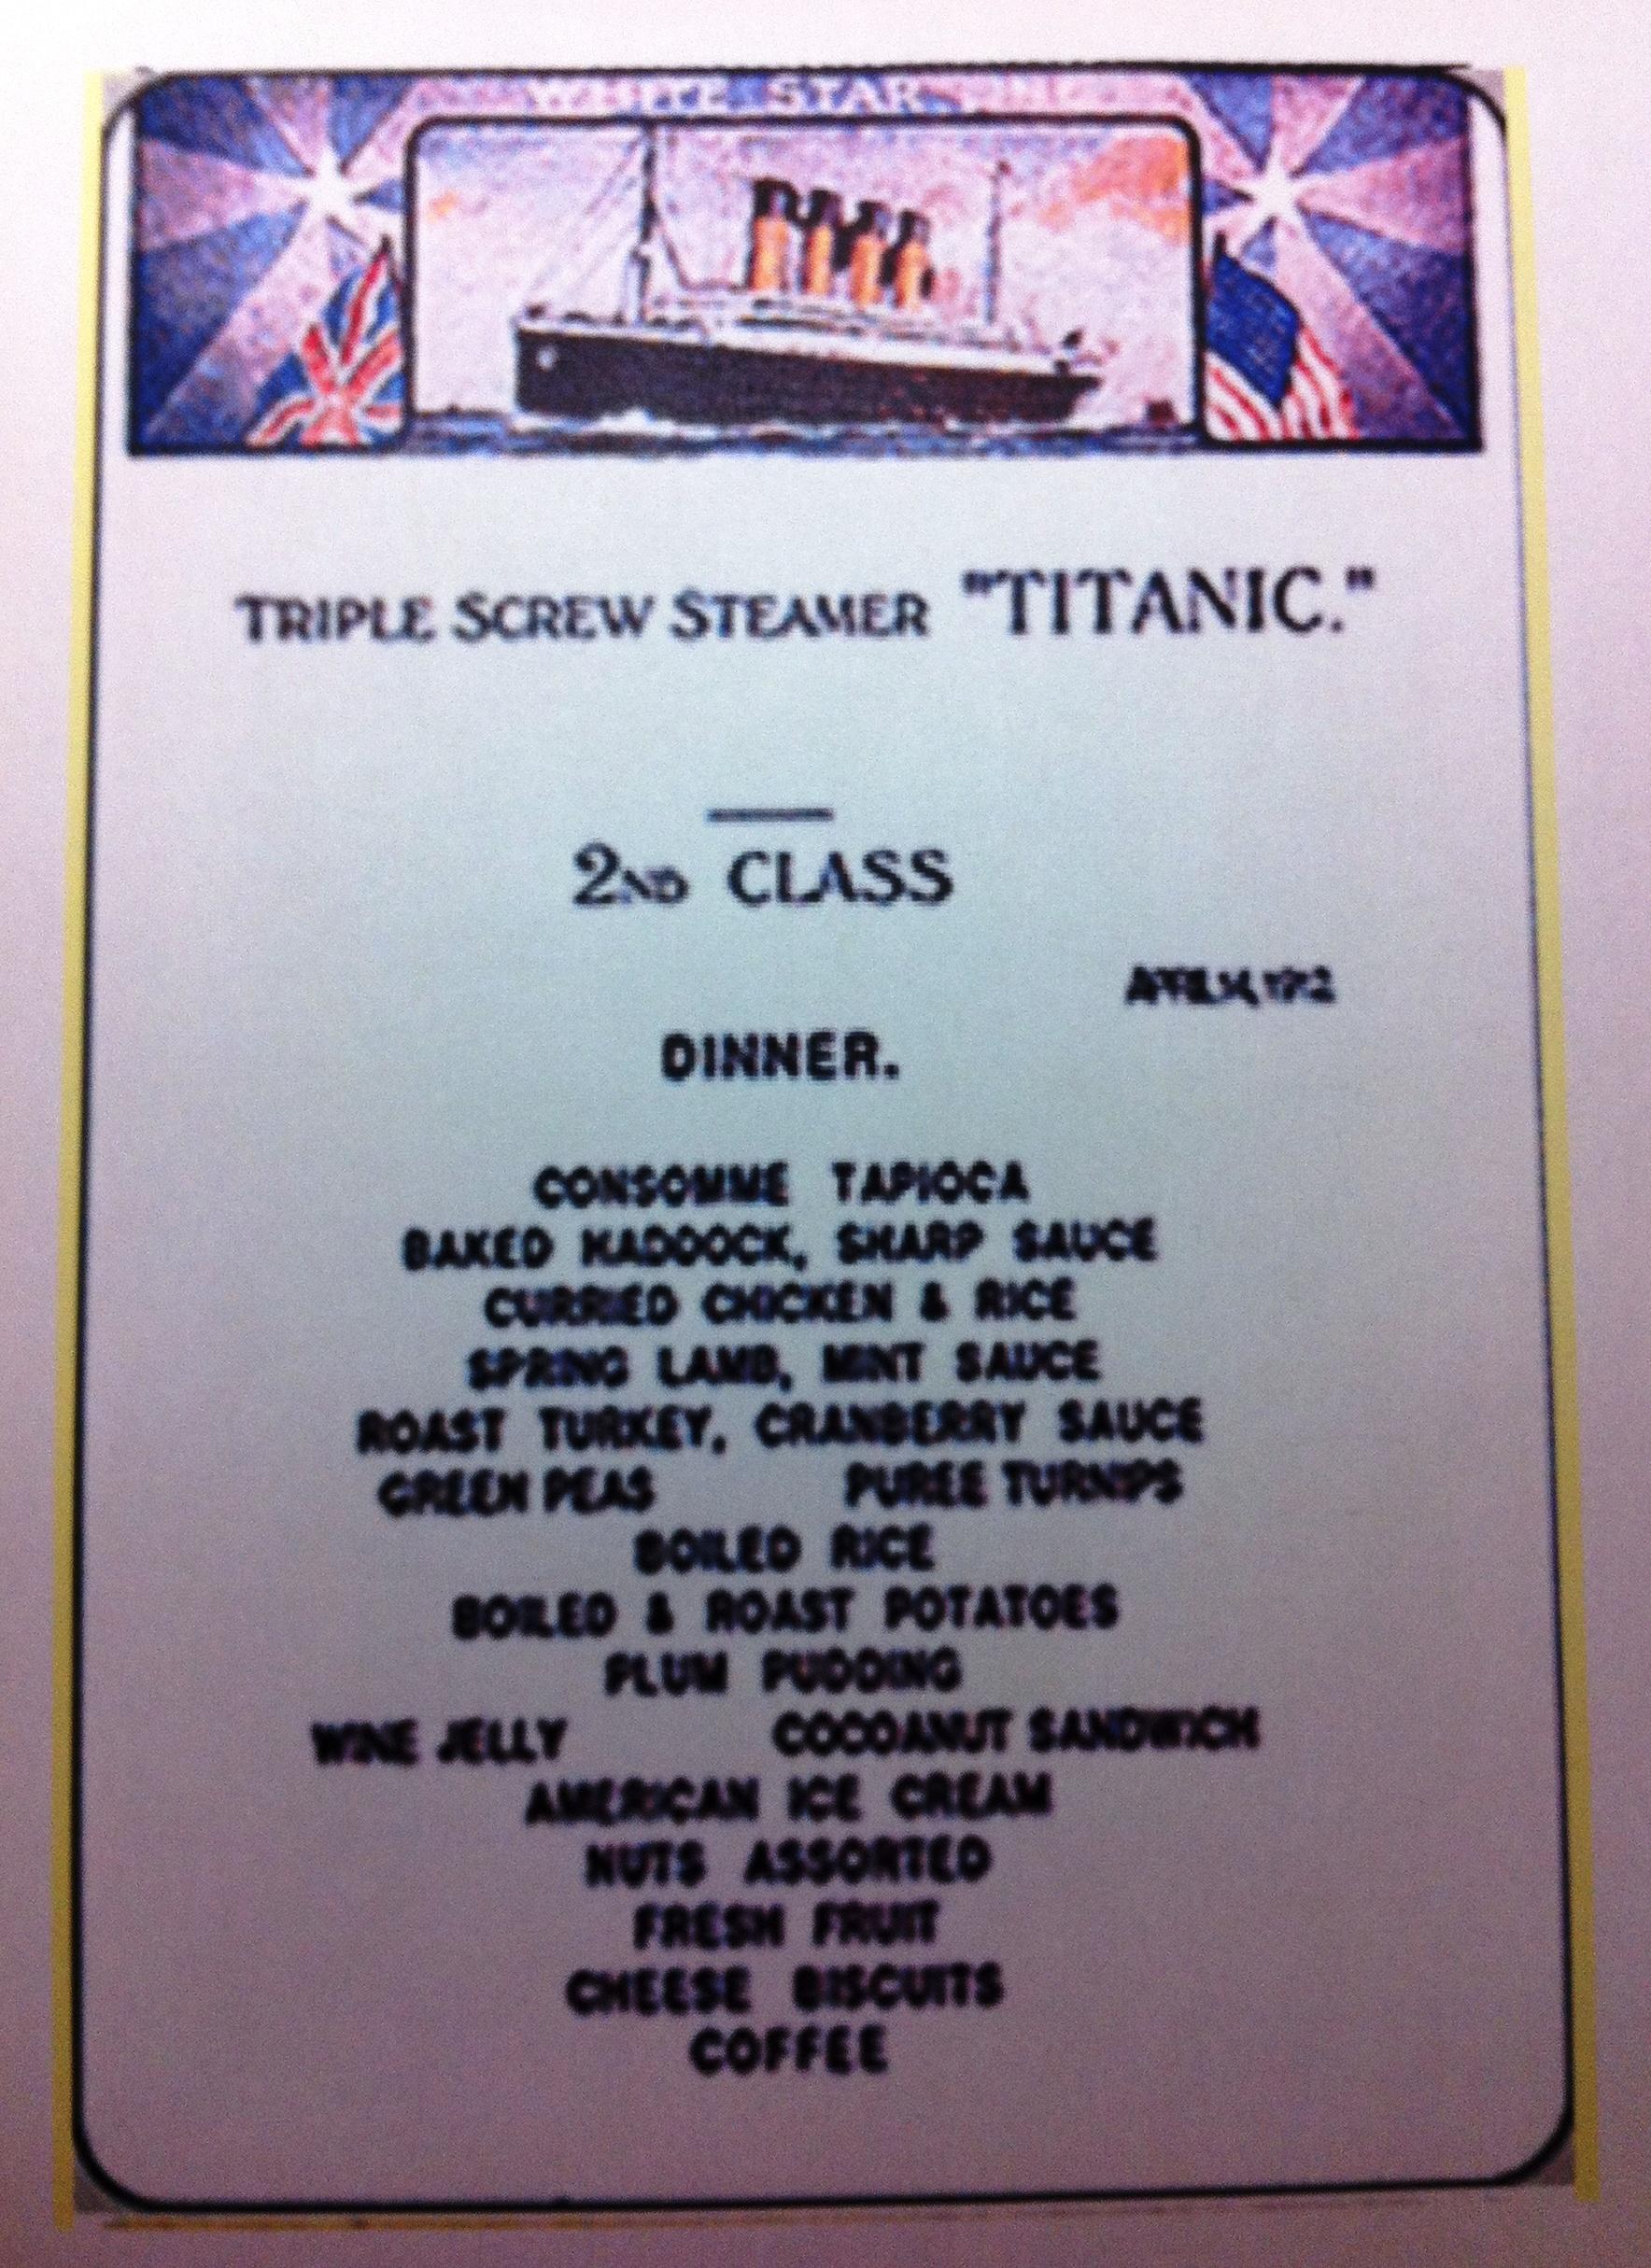 Planning Your Titanic Tribute 2nd Class Menu Downton